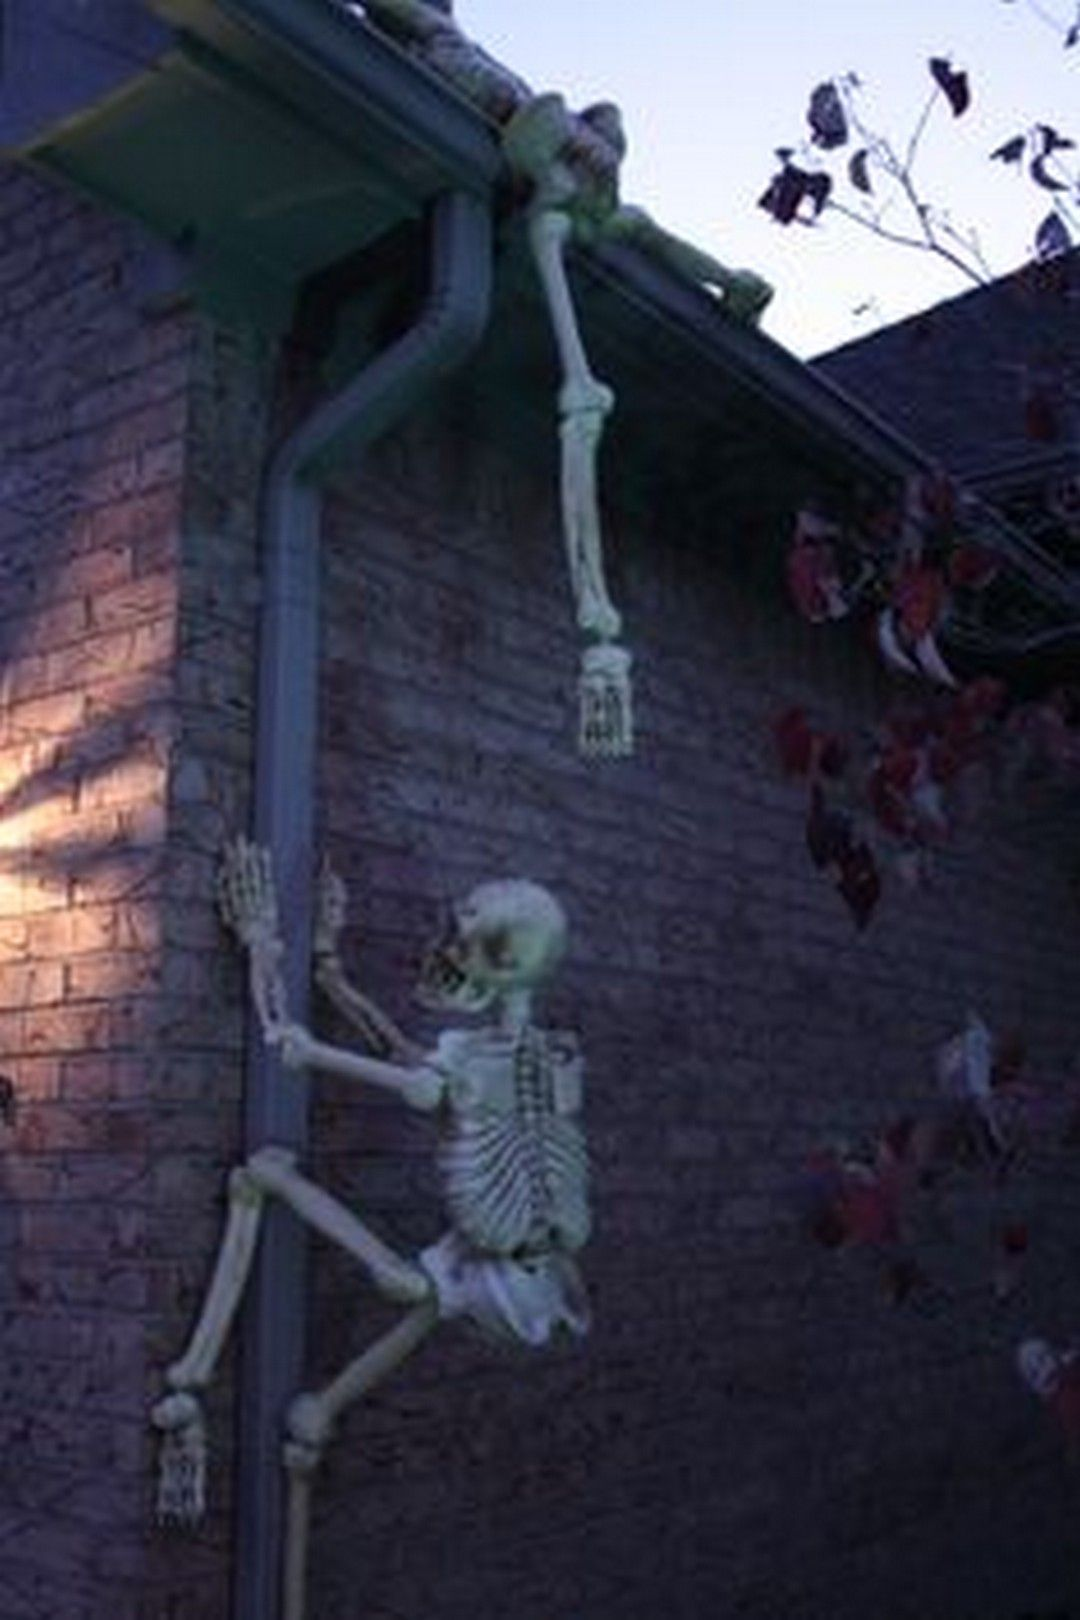 14 Fun Ways Outside Halloween Decorations You Must Try Halloween - fun halloween decorations